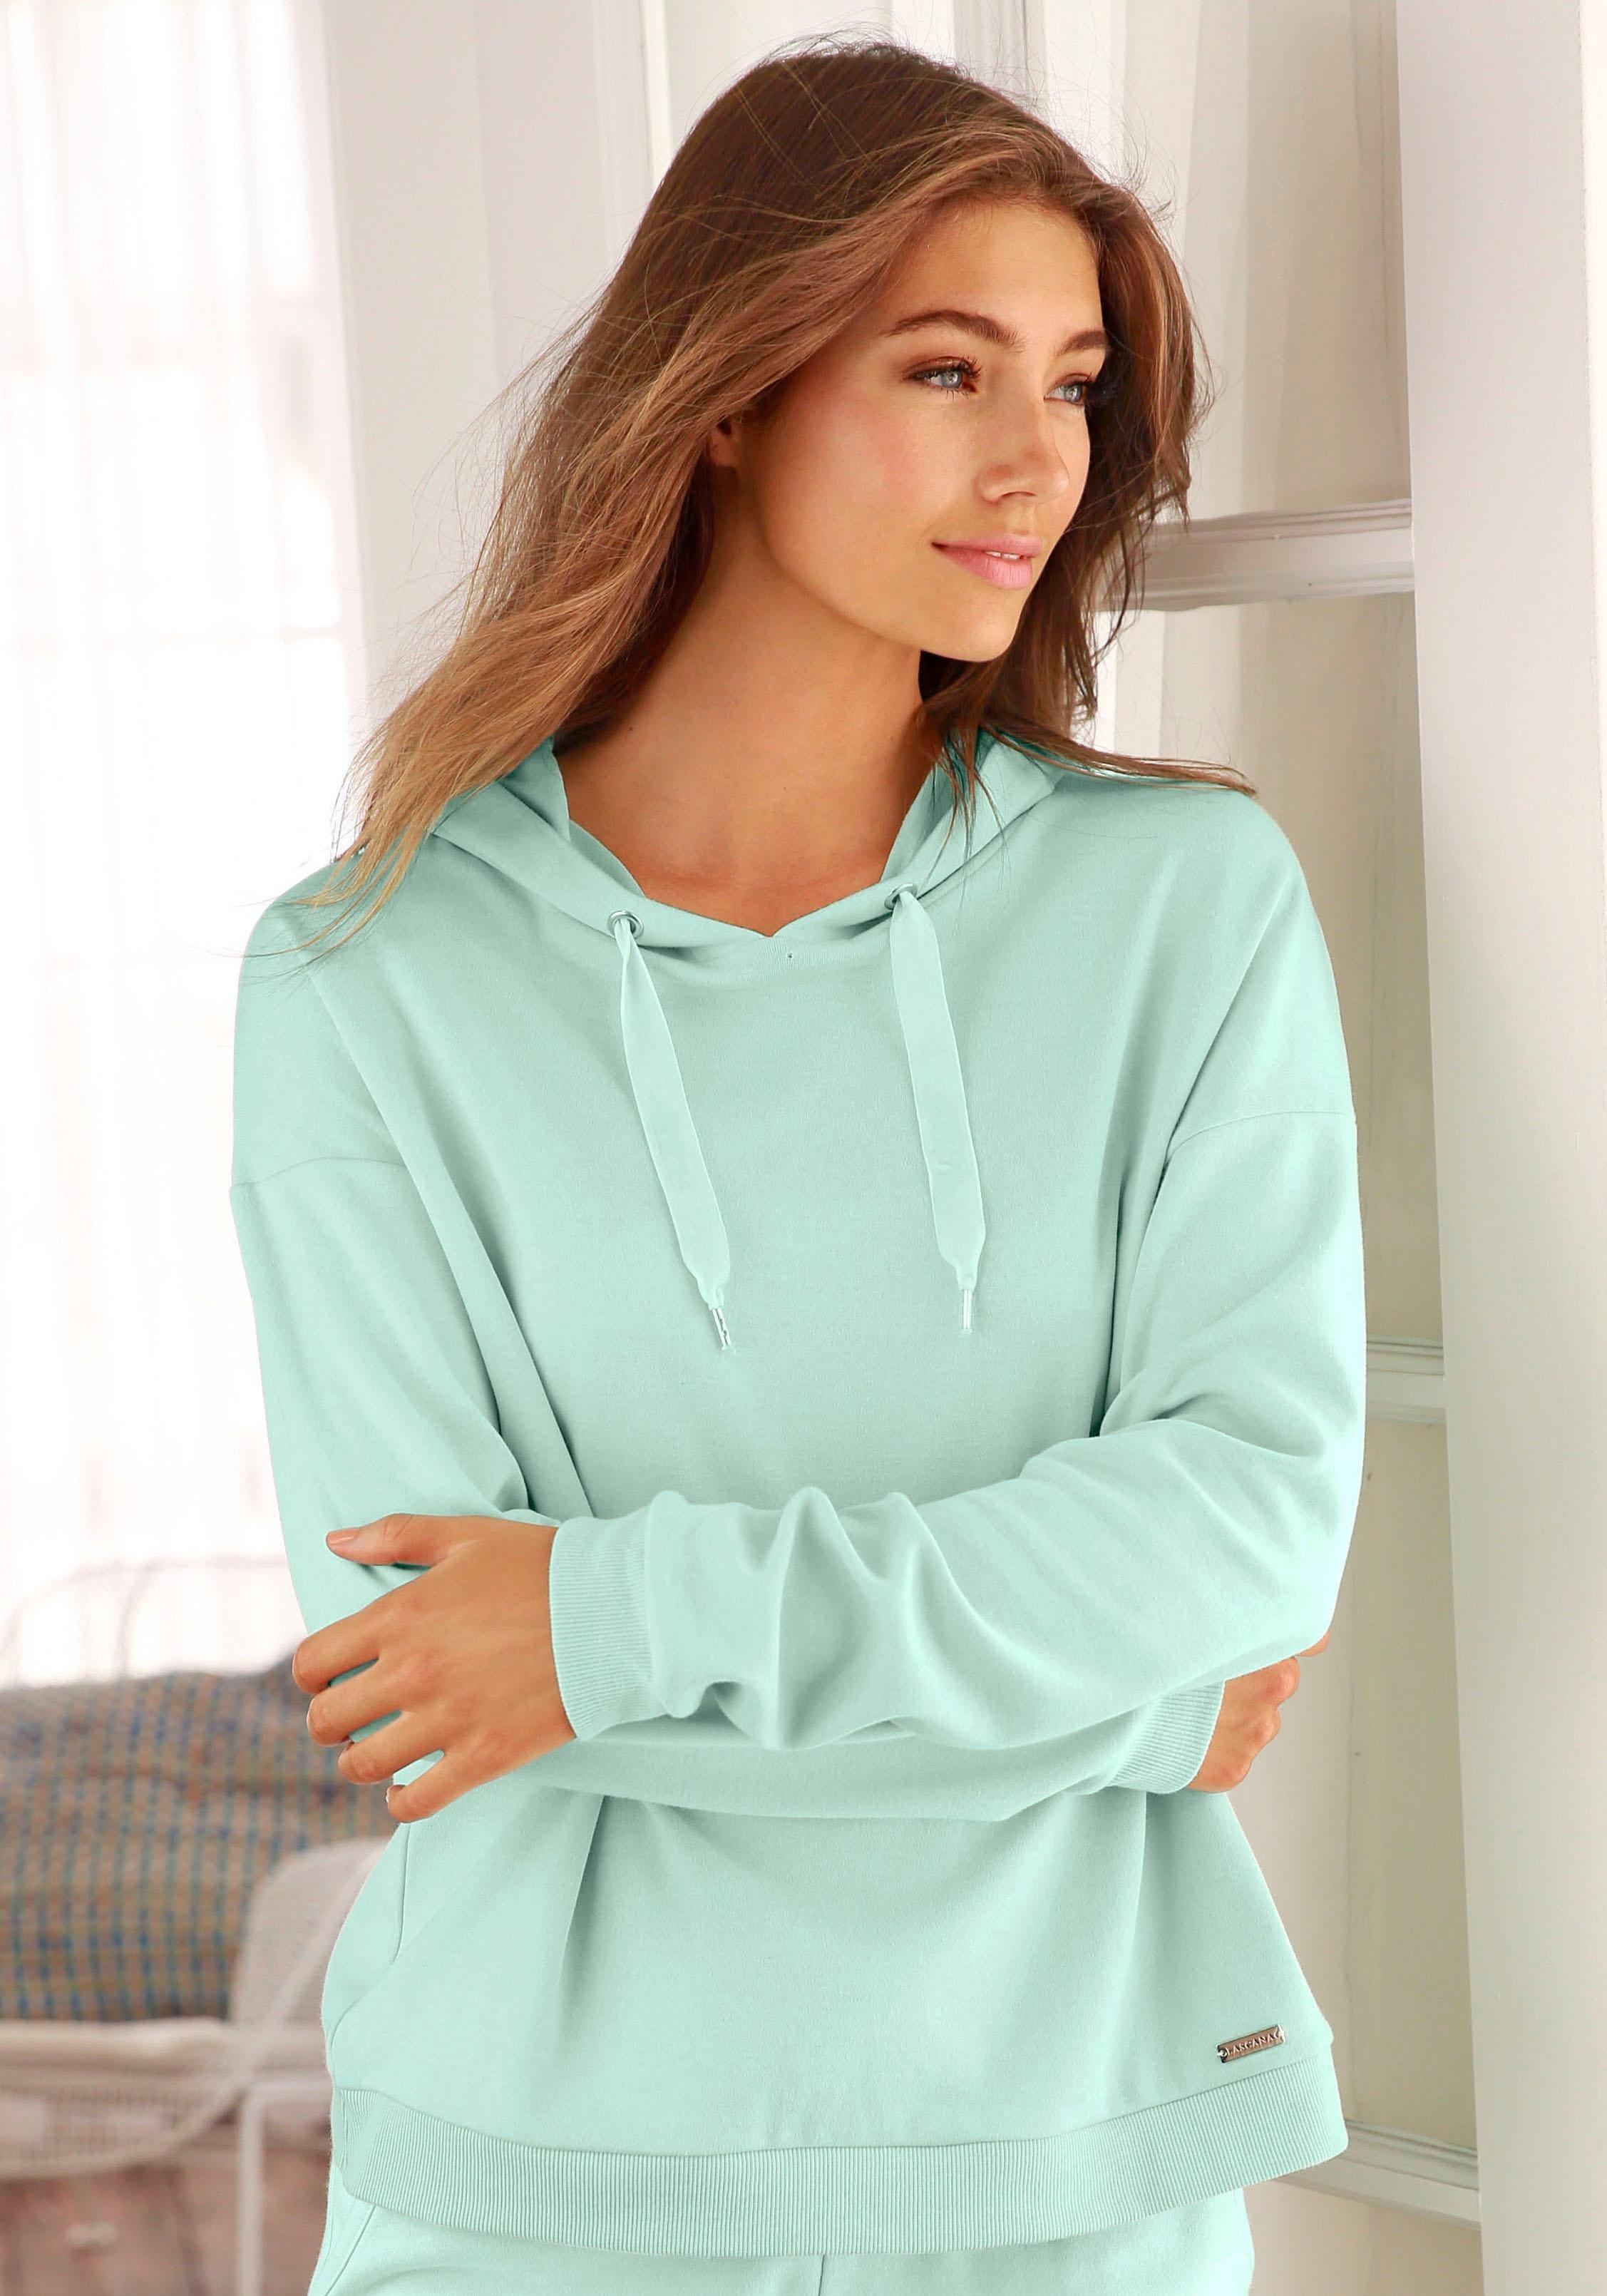 LASCANA Kapuzenshirt mit offenem Rückenteil in Layeroptik | Bekleidung > Shirts > Kapuzenshirts | Grün | Baumwolle | Lascana